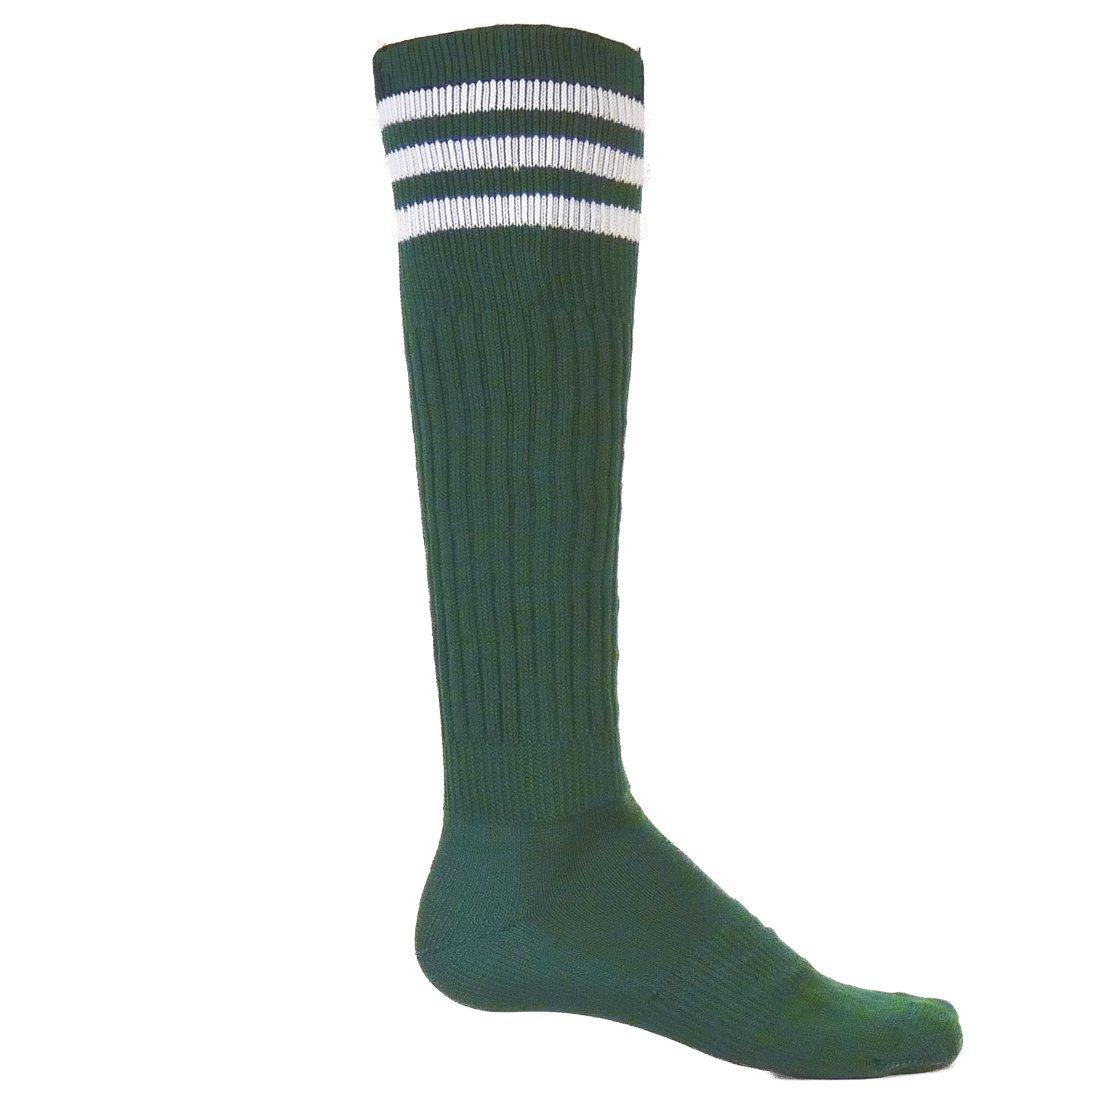 Red Lion Mach III Athletic Sport Wear High Knee Socks ( Kelly / White - Medium )